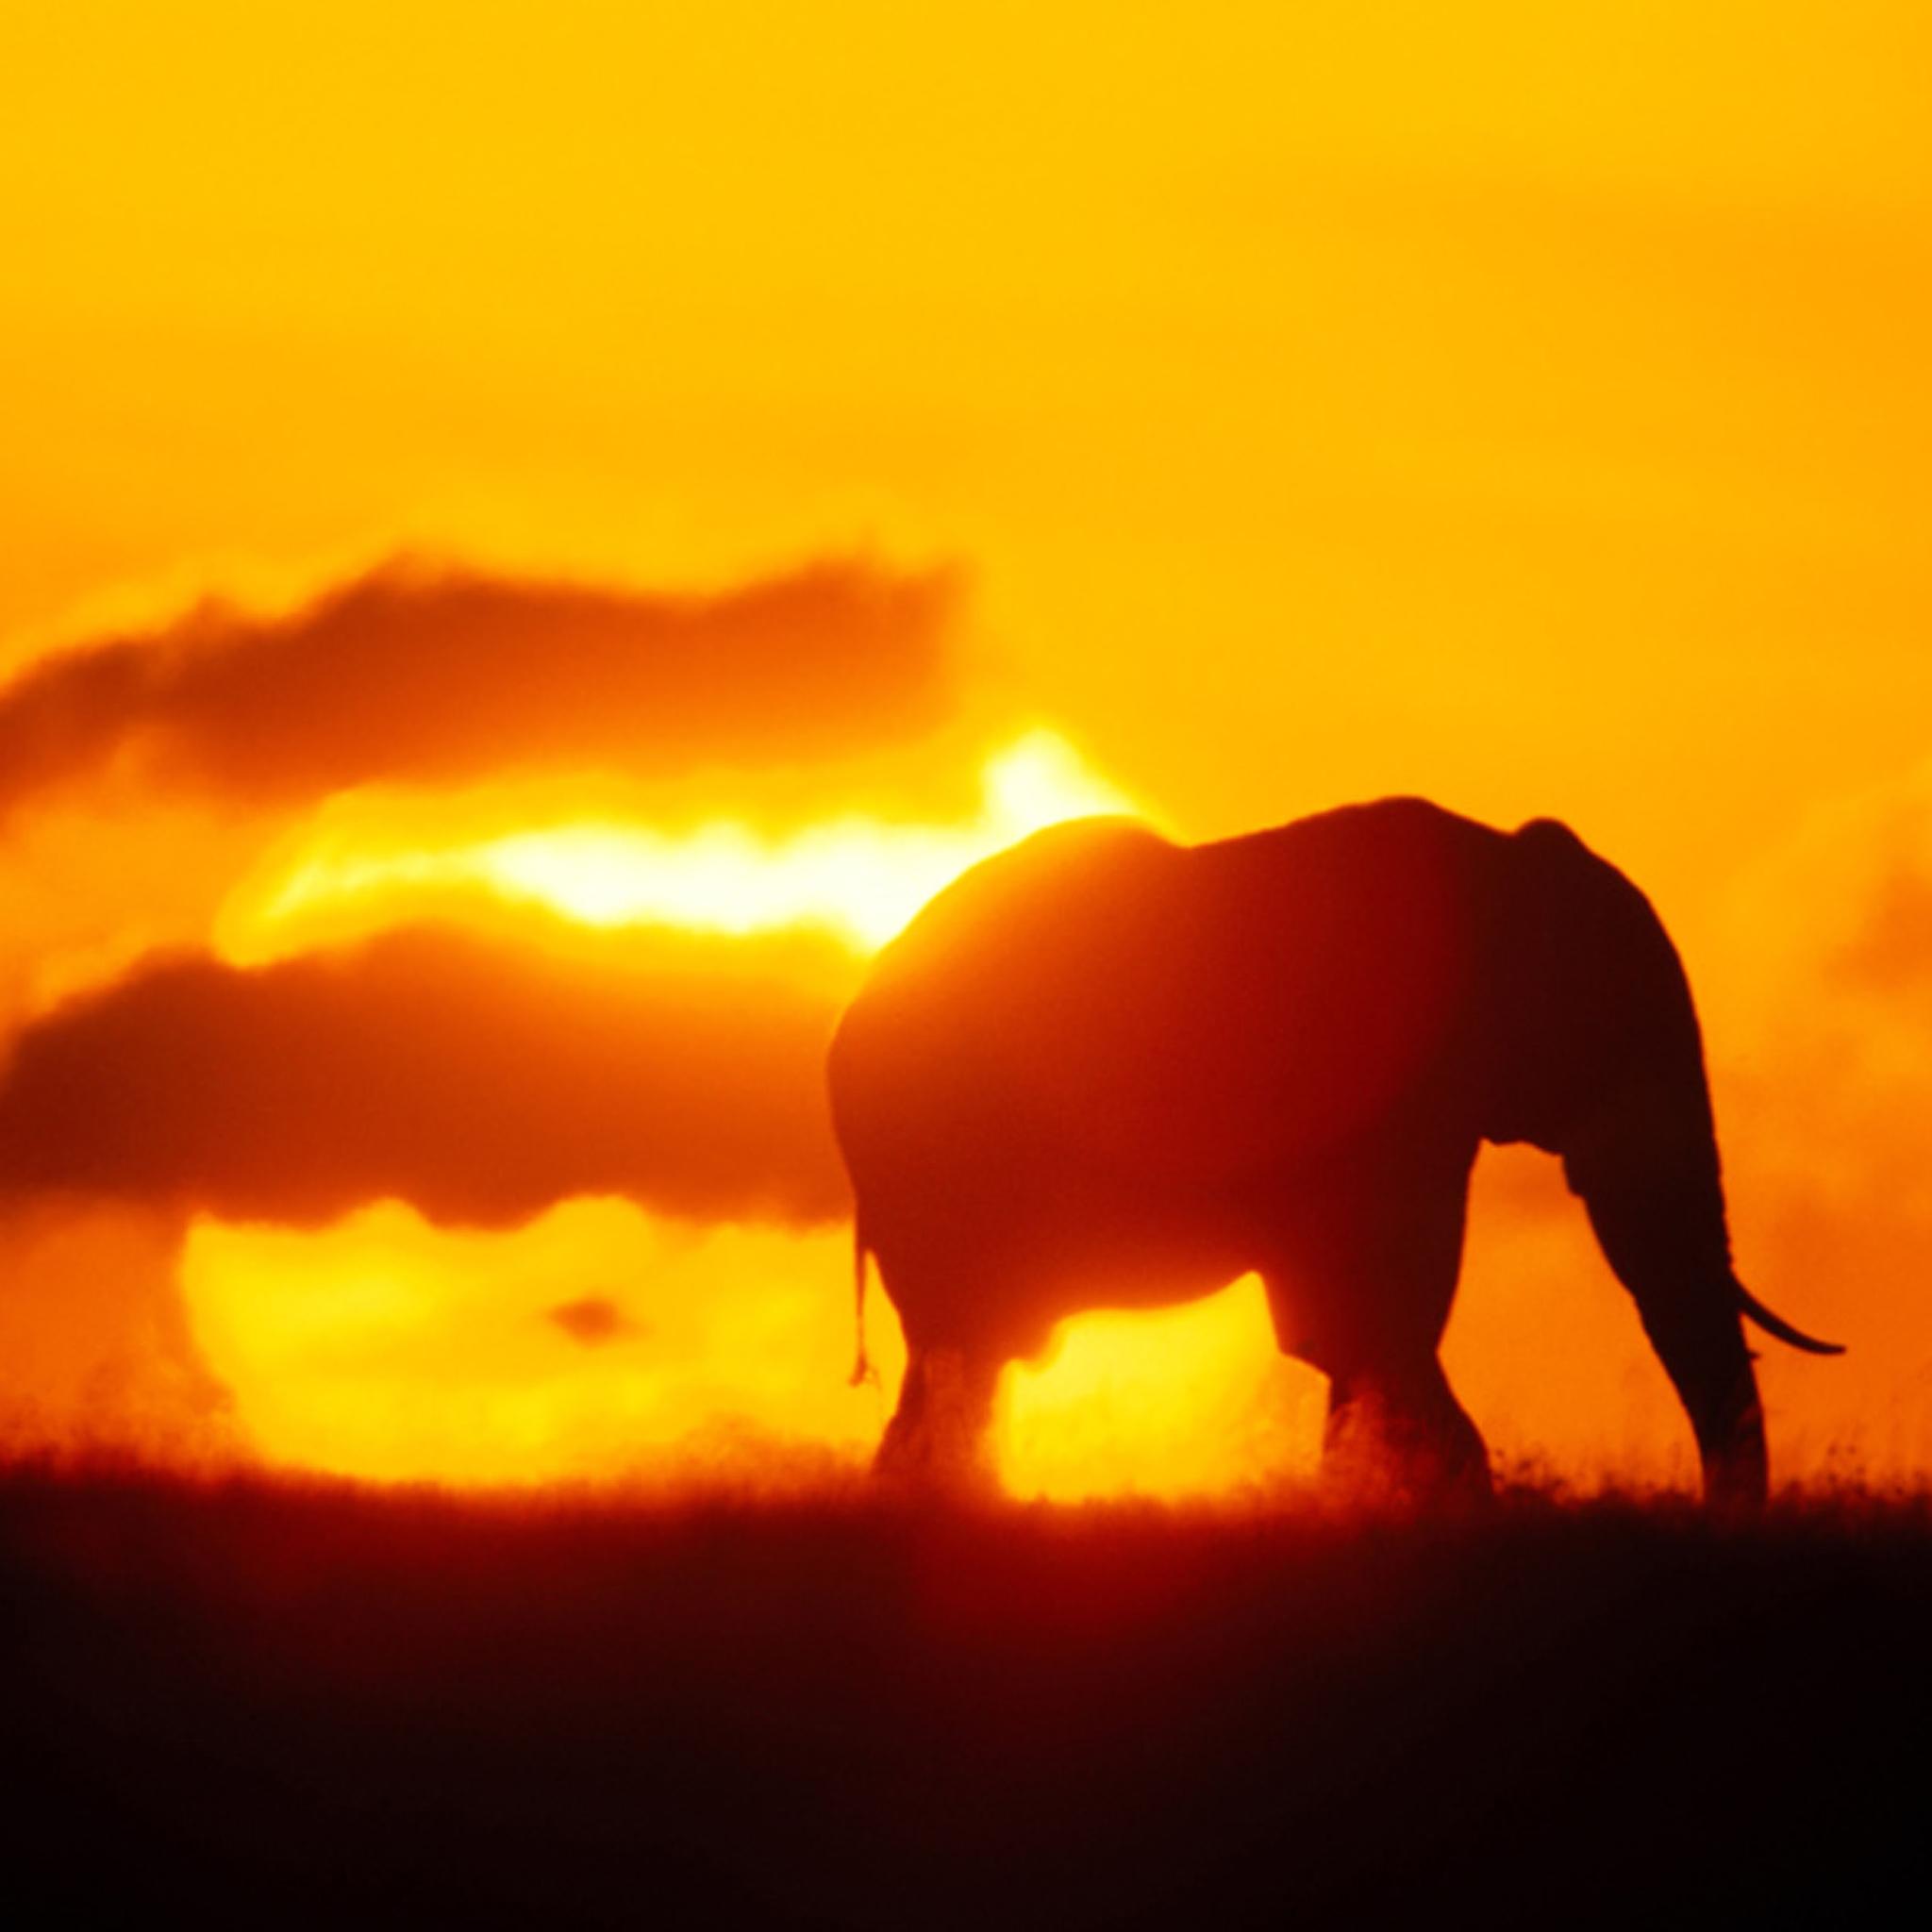 Sunrise Elephant 3Wallpapers iPad Sunrise Elephant   iPad